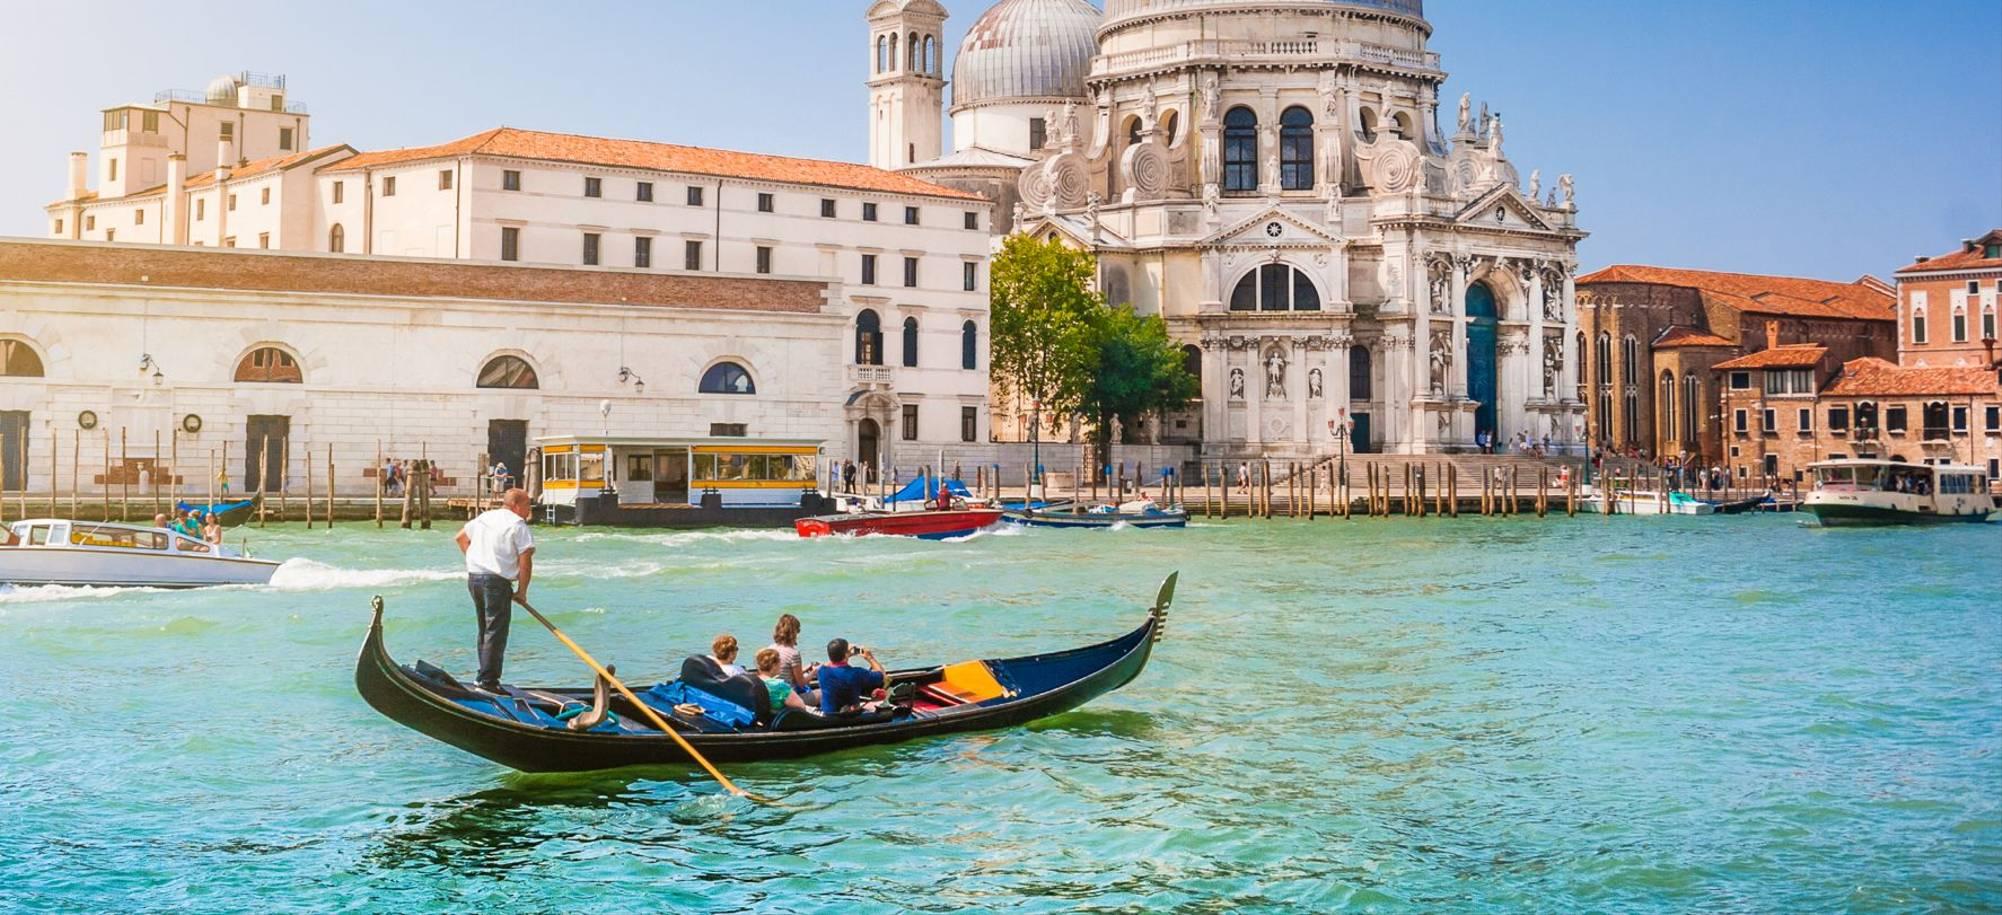 Venice   Gondola   Itinerary Desktop